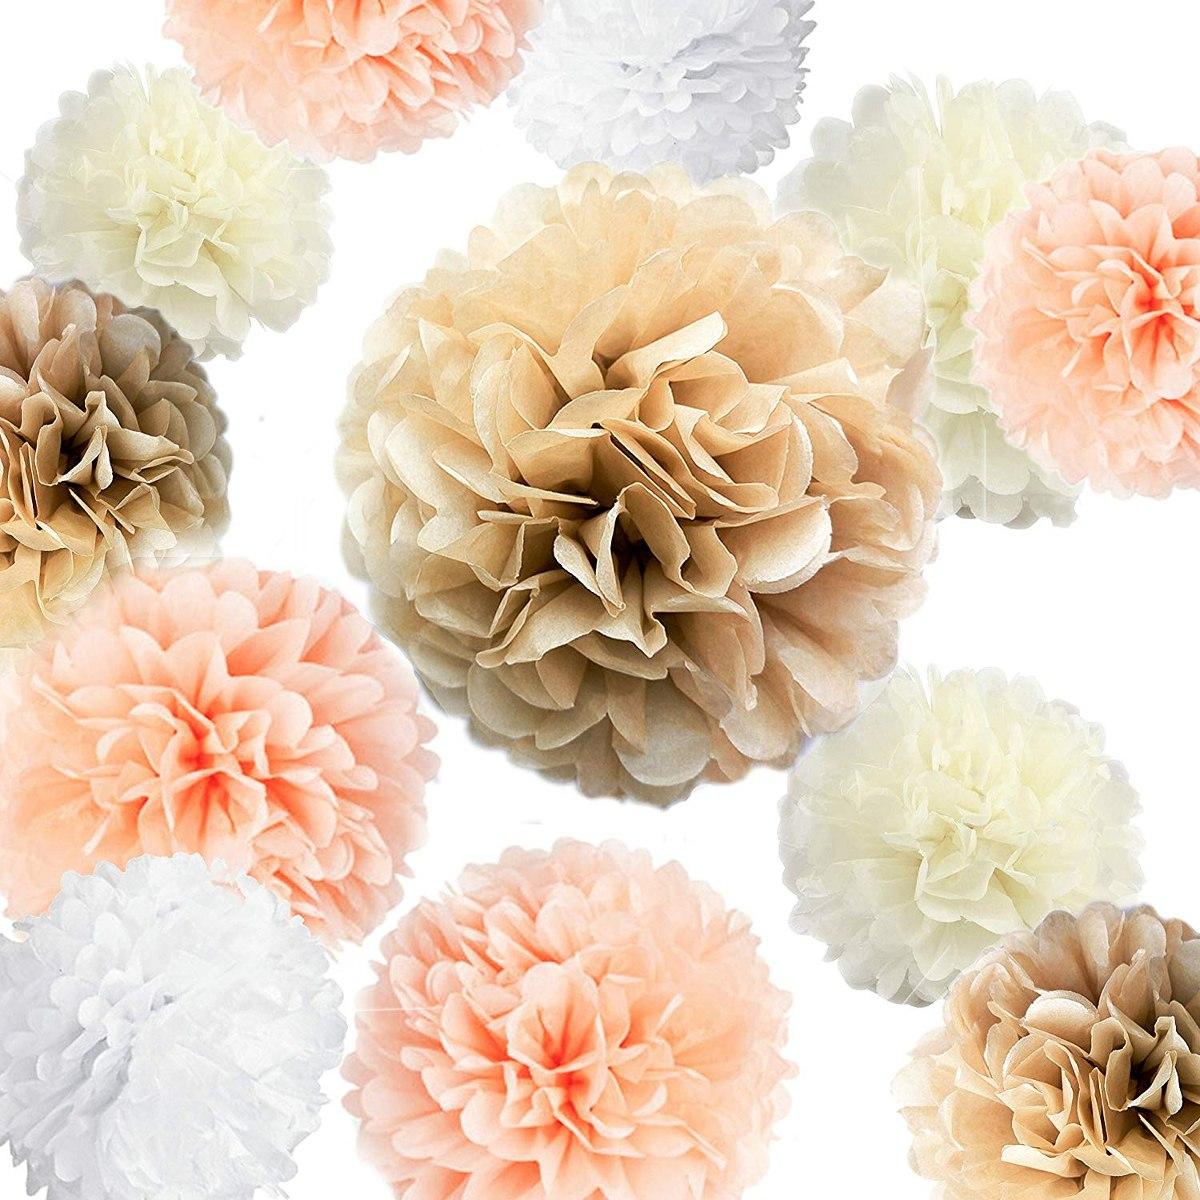 3 Easy Designs of Crafts Out Otissue Paper Vidal Crafts 20 Pcs Party Tissue Paper Pom Poms Set 14 10